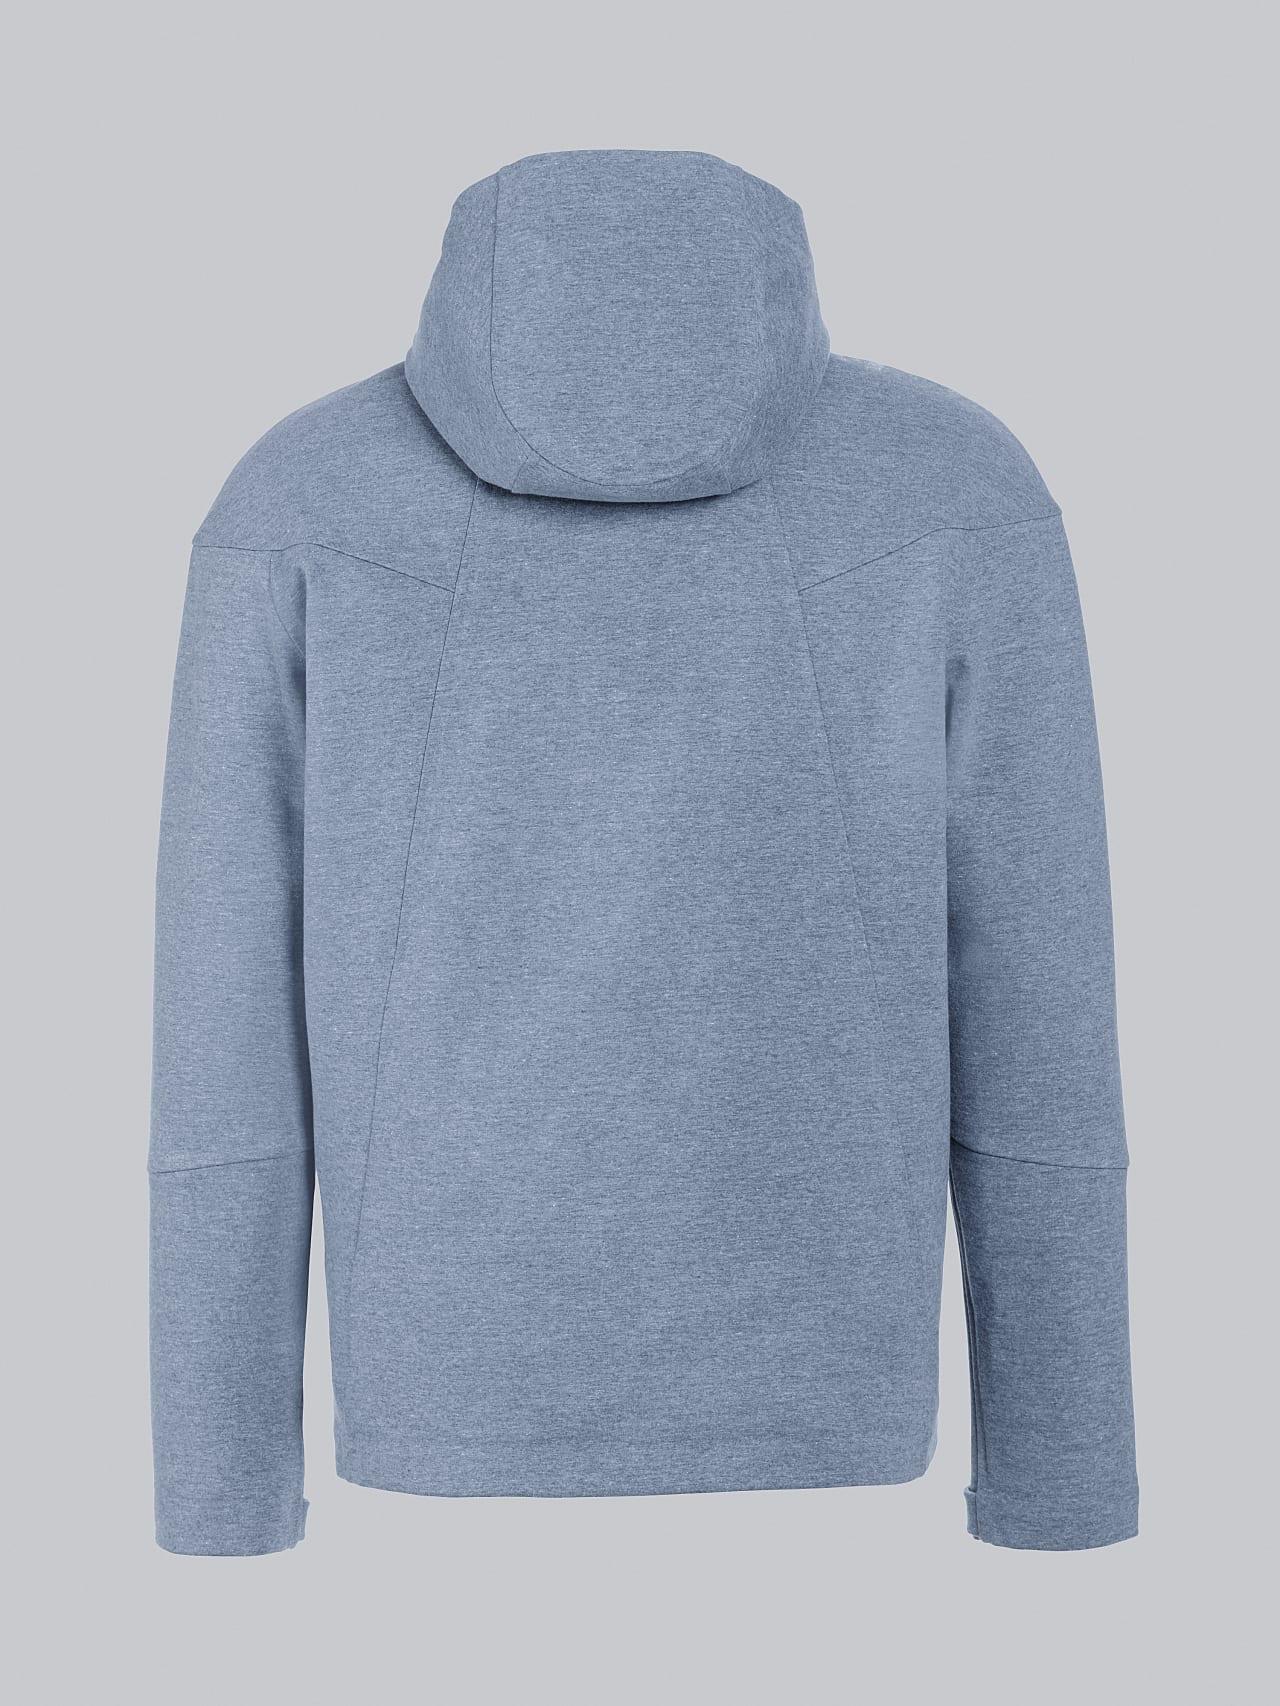 SROTE V1.Y5.02 Waterproof Sweatjacket medium blue Left Alpha Tauri